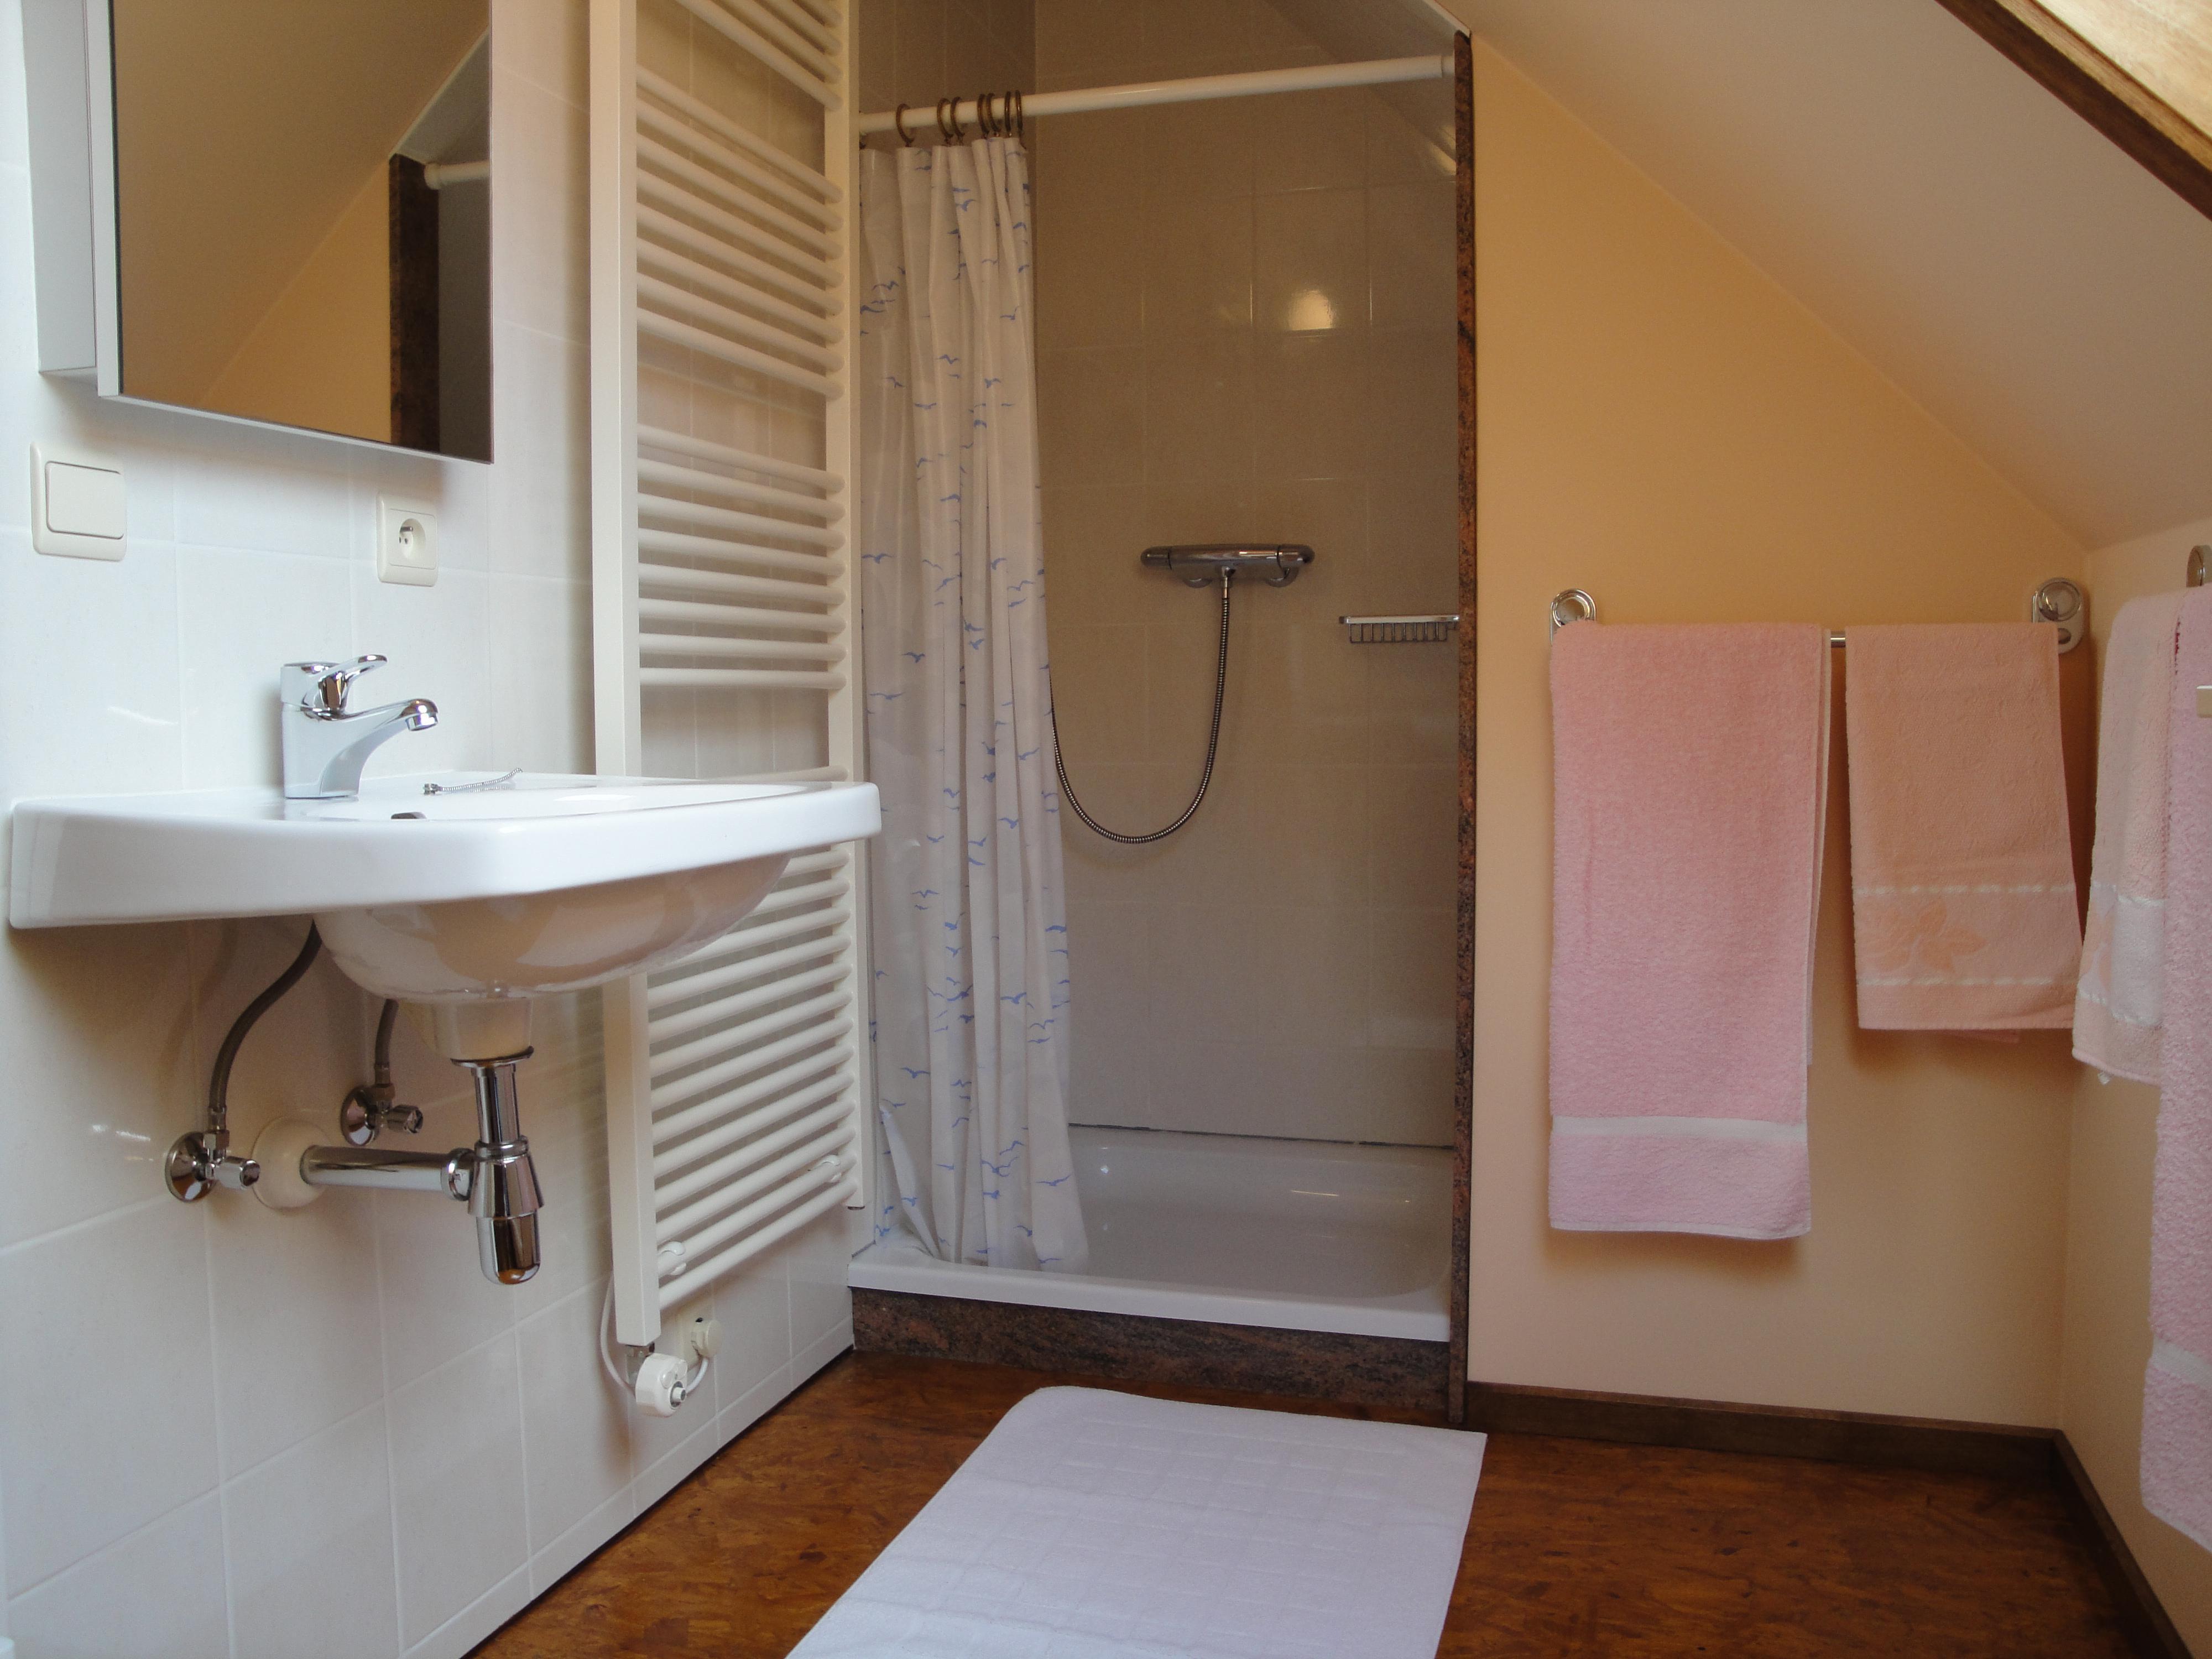 Fotogalerij gastenverblijf 39 t prieeltje diepenbeek - Kamer badkamer ...